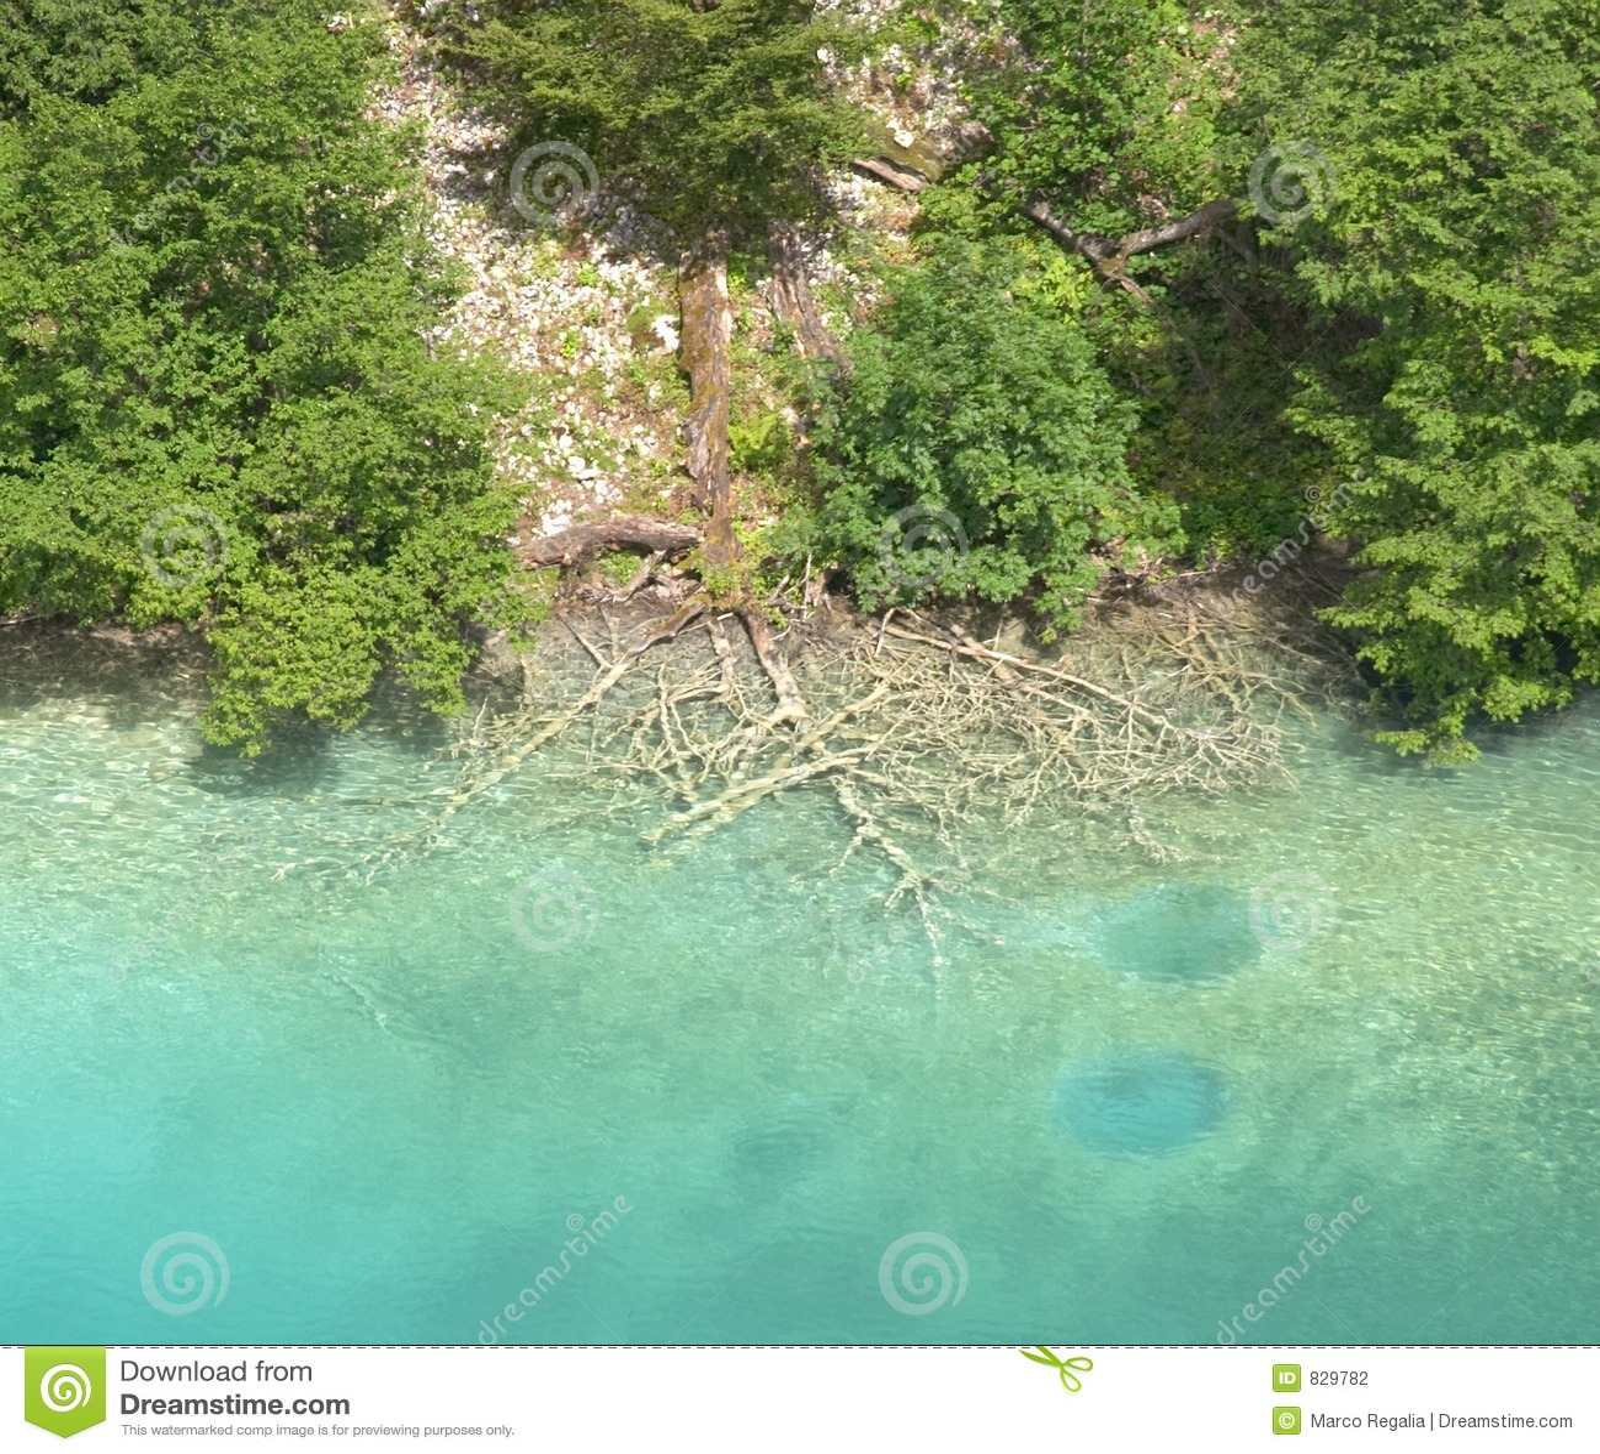 Plitvice lake (Plitvicka jezera) Croatia